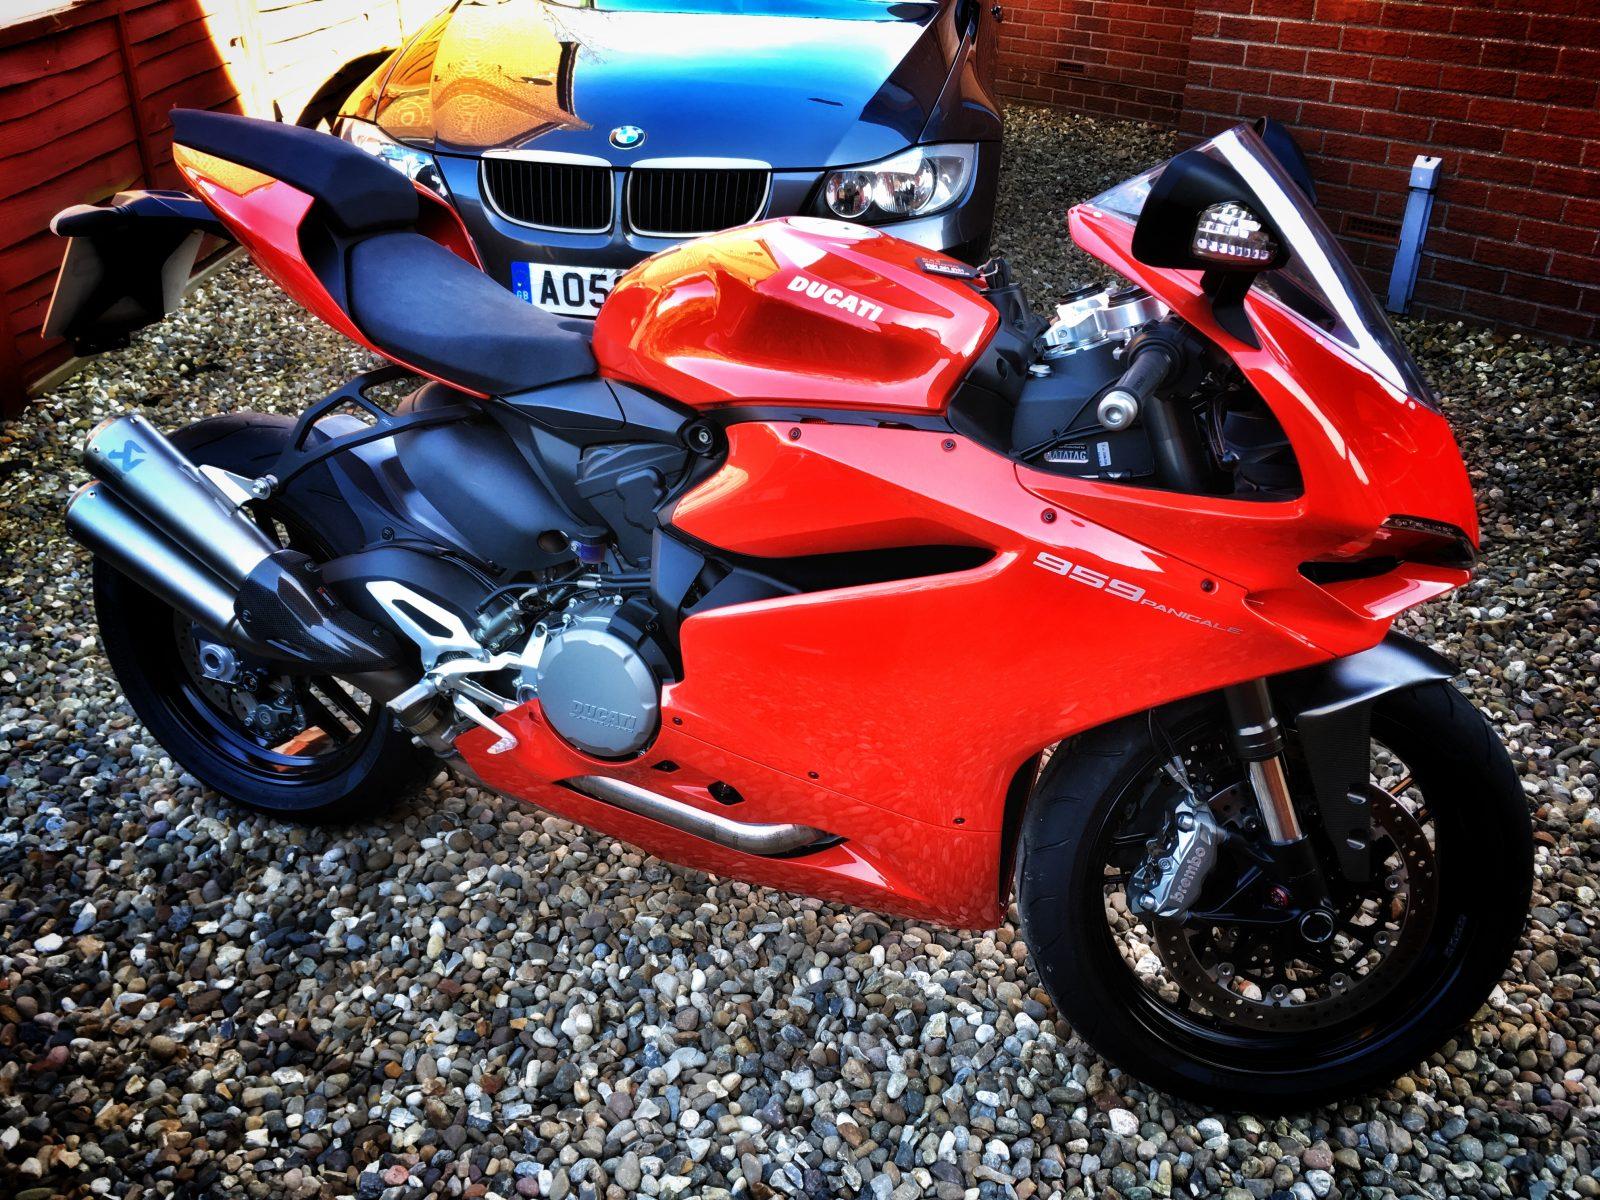 Ducati 959 Panigale